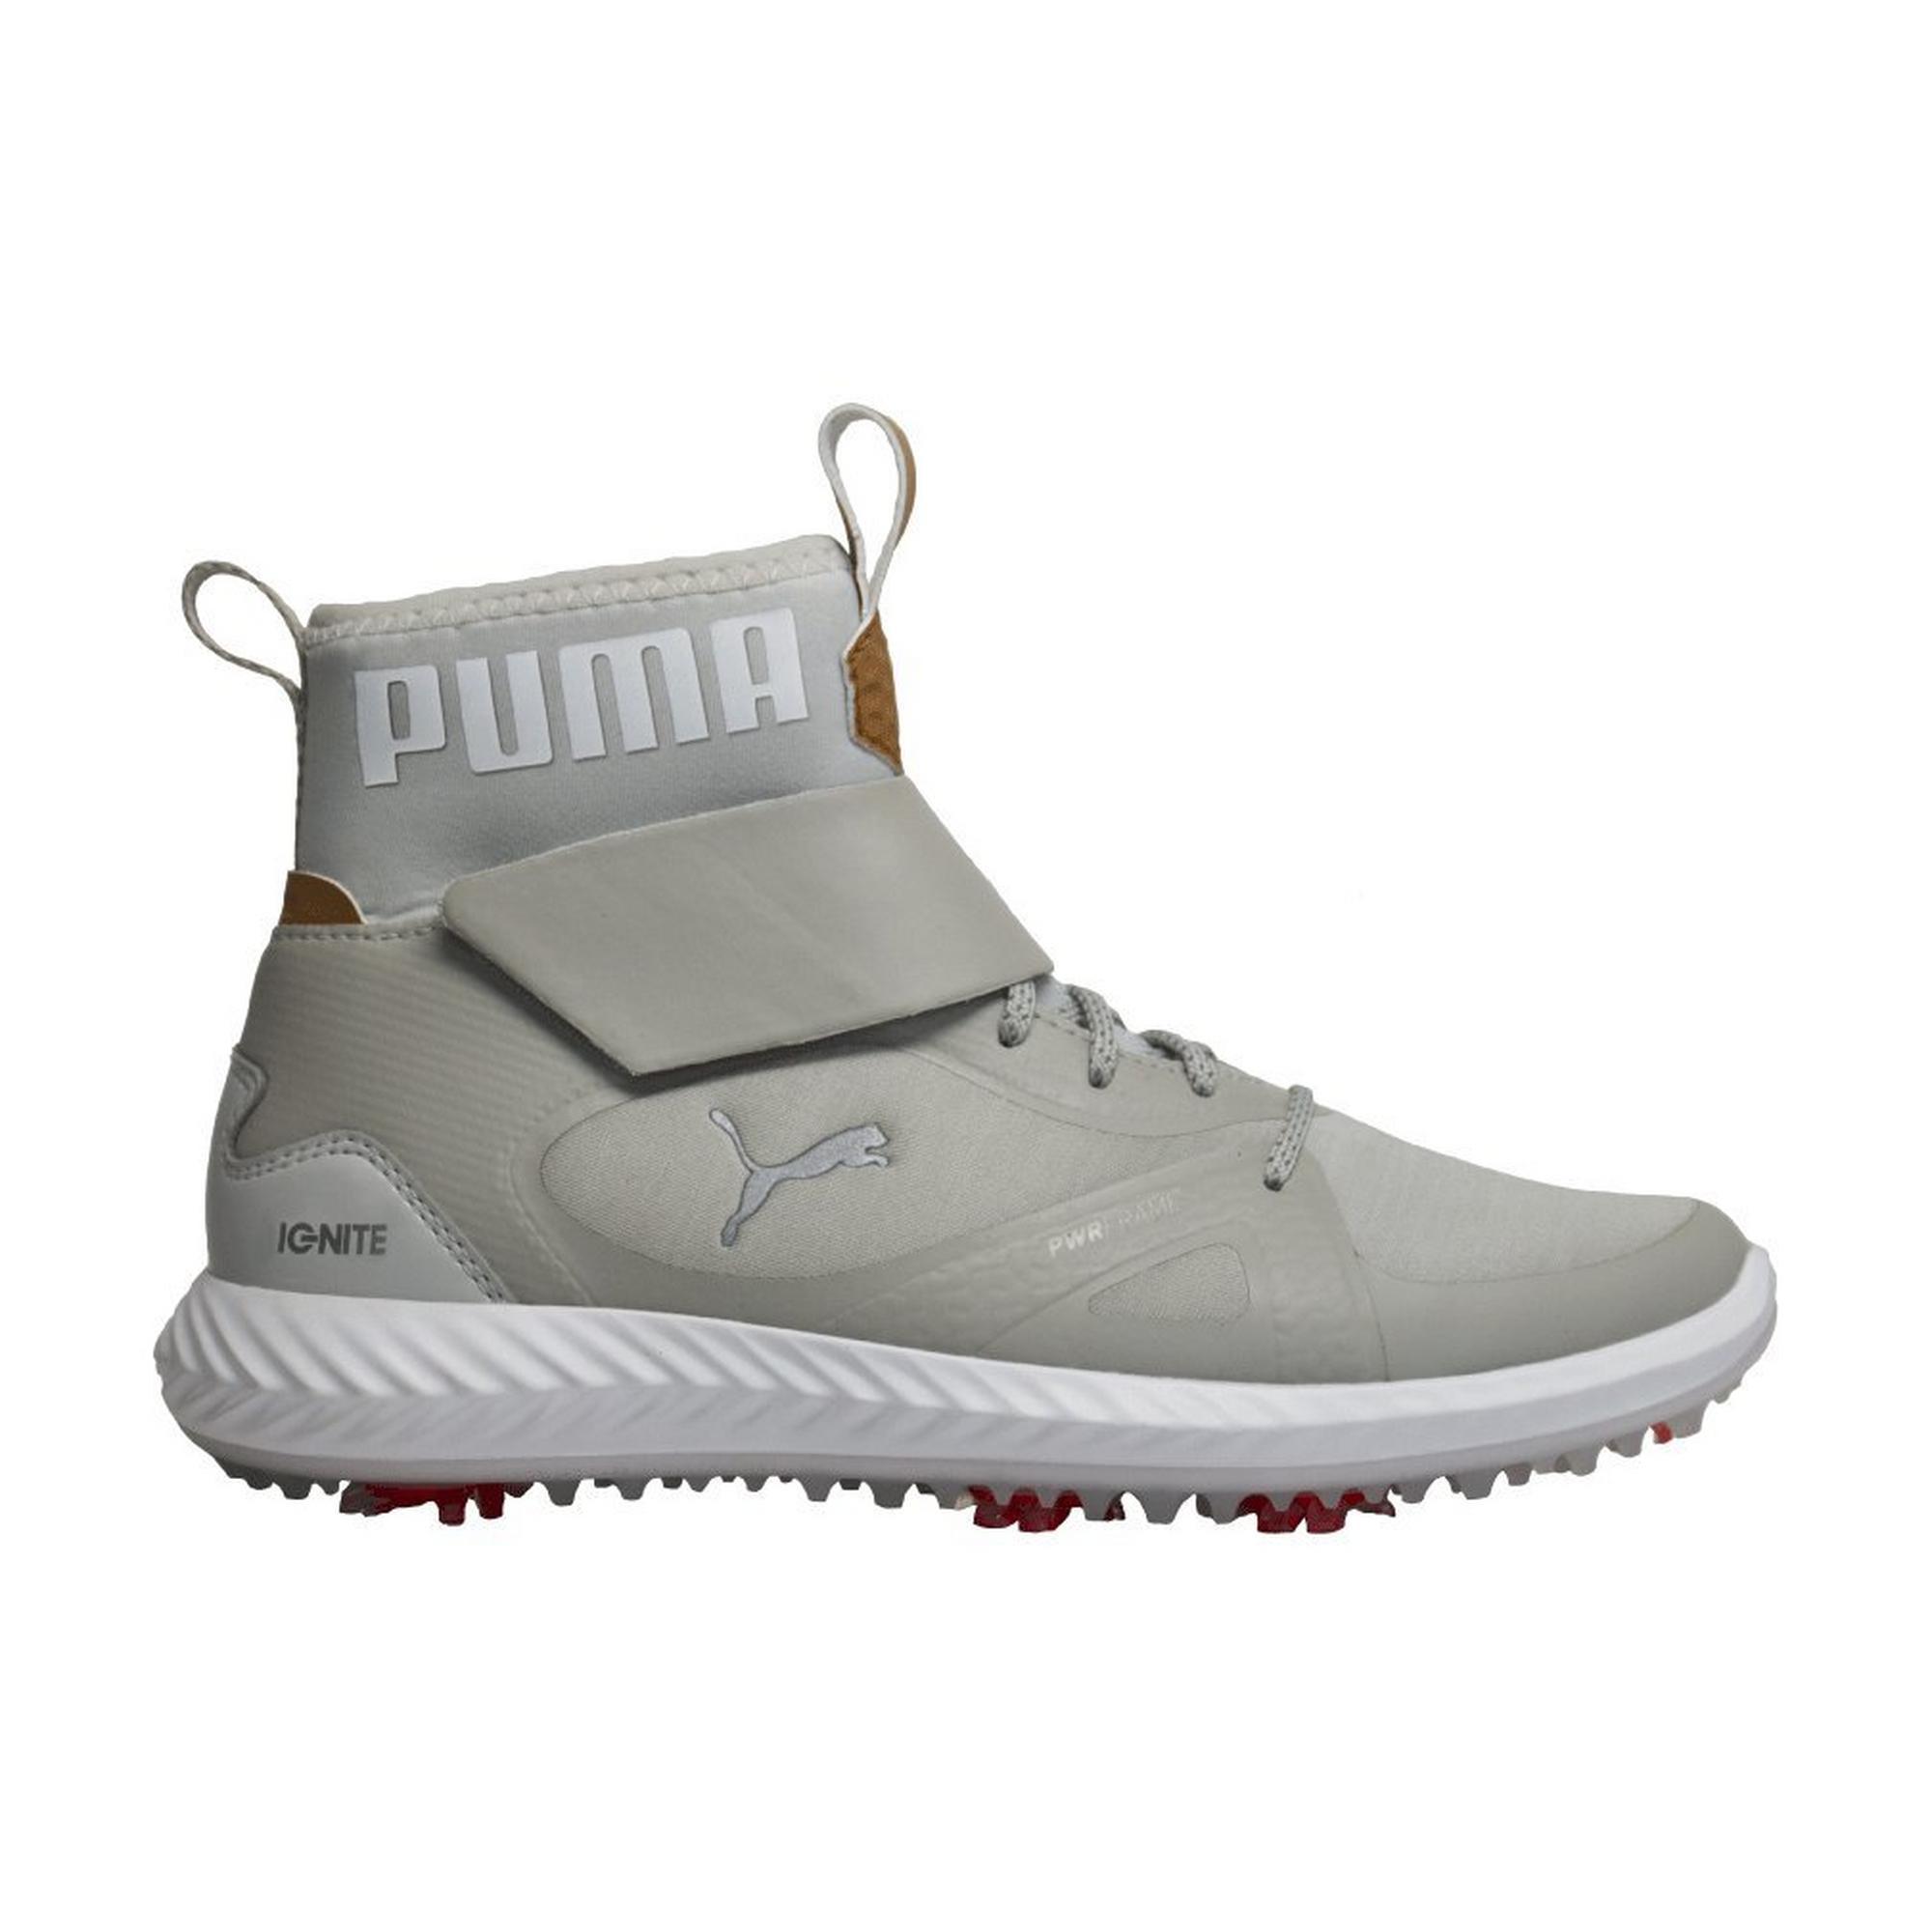 Chaussures Ignite Poweradapt Hi-Top à crampons pour juniors - Blanc/Argent